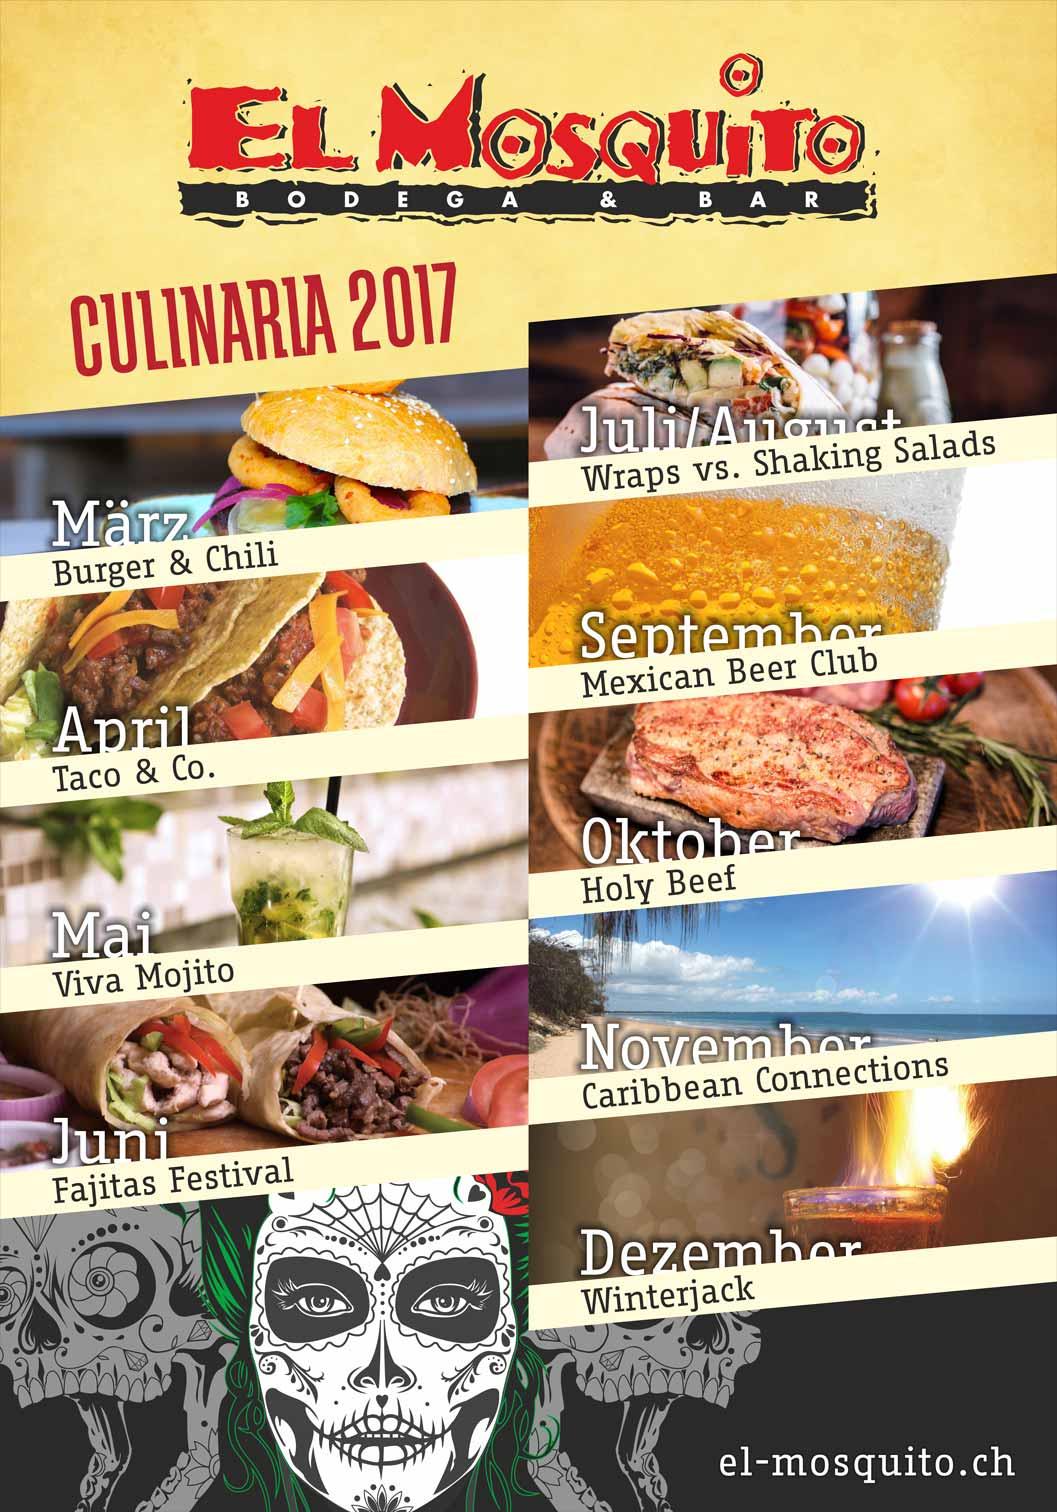 Culinaria-2017-Steller---GzD.jpg